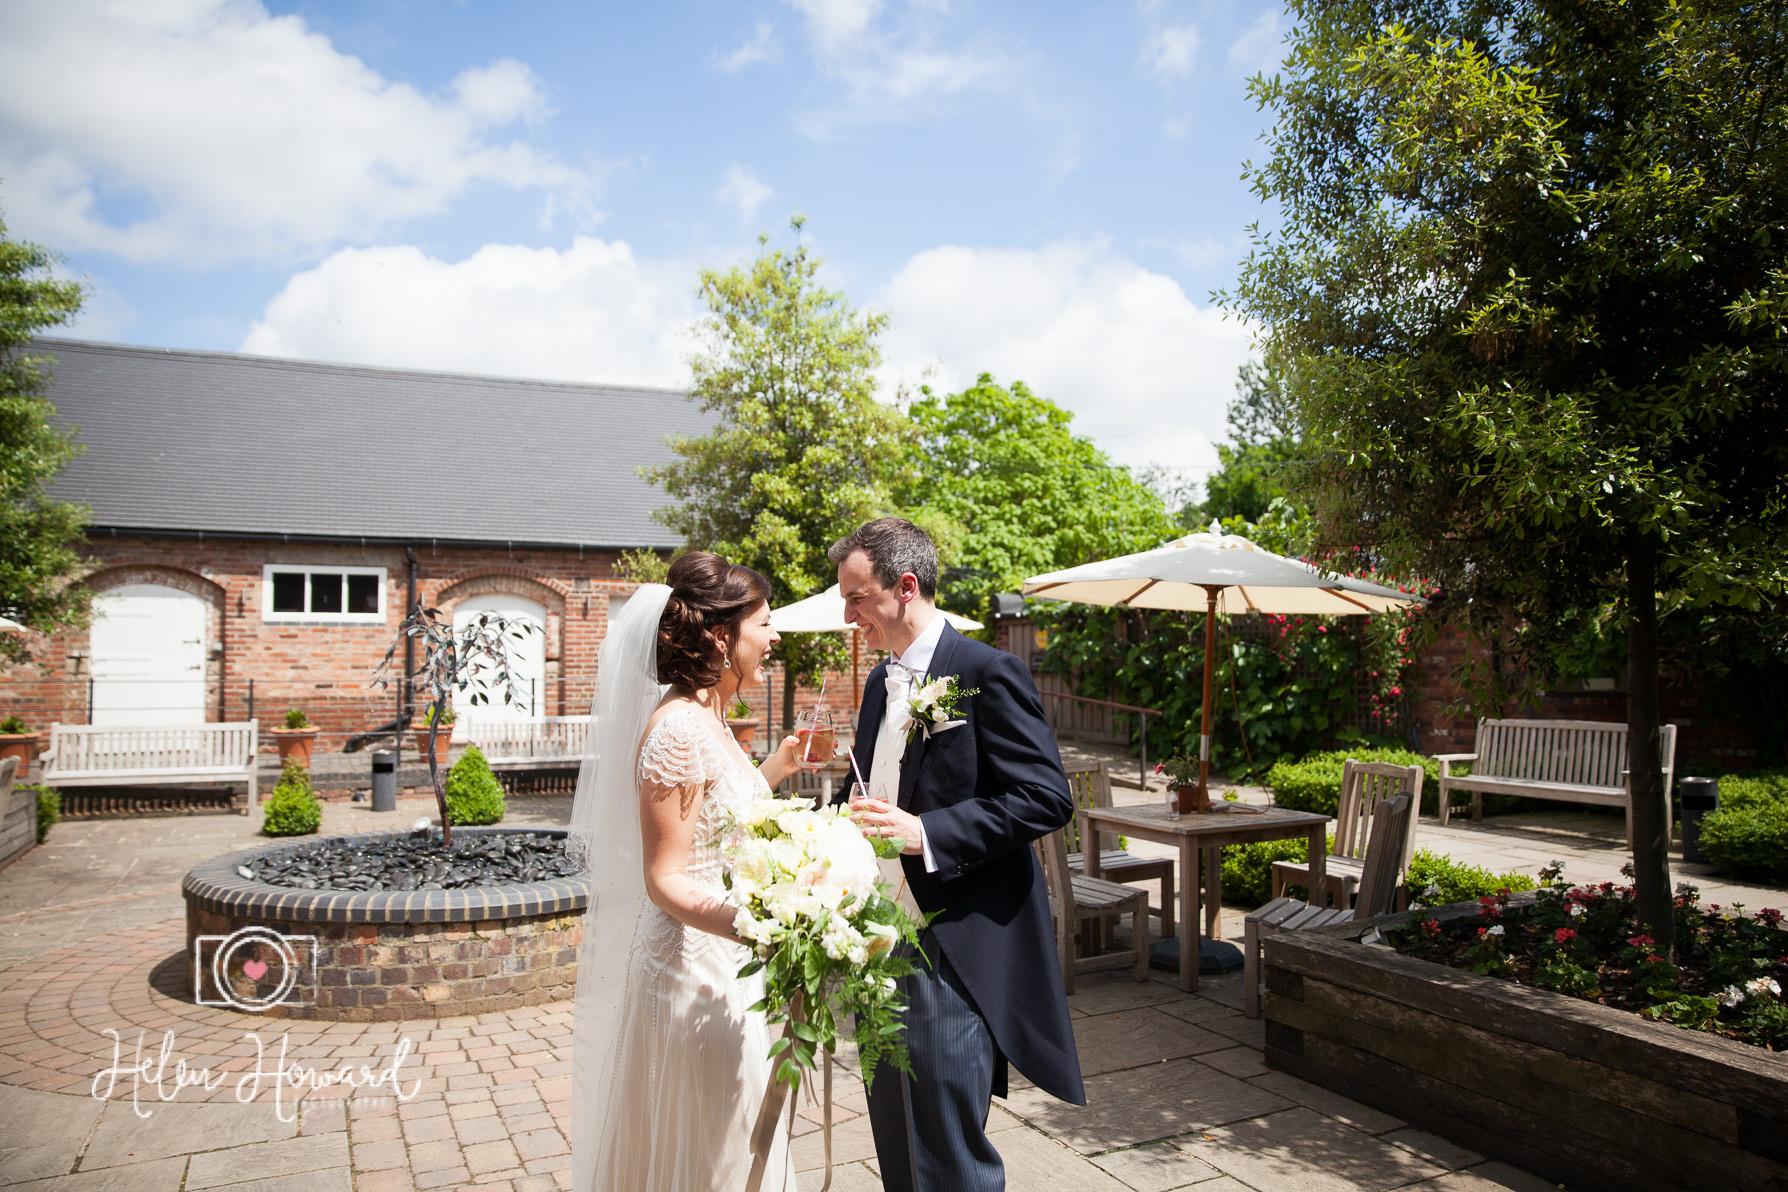 Helen Howard Photography Packington Moor Wedding-66.jpg